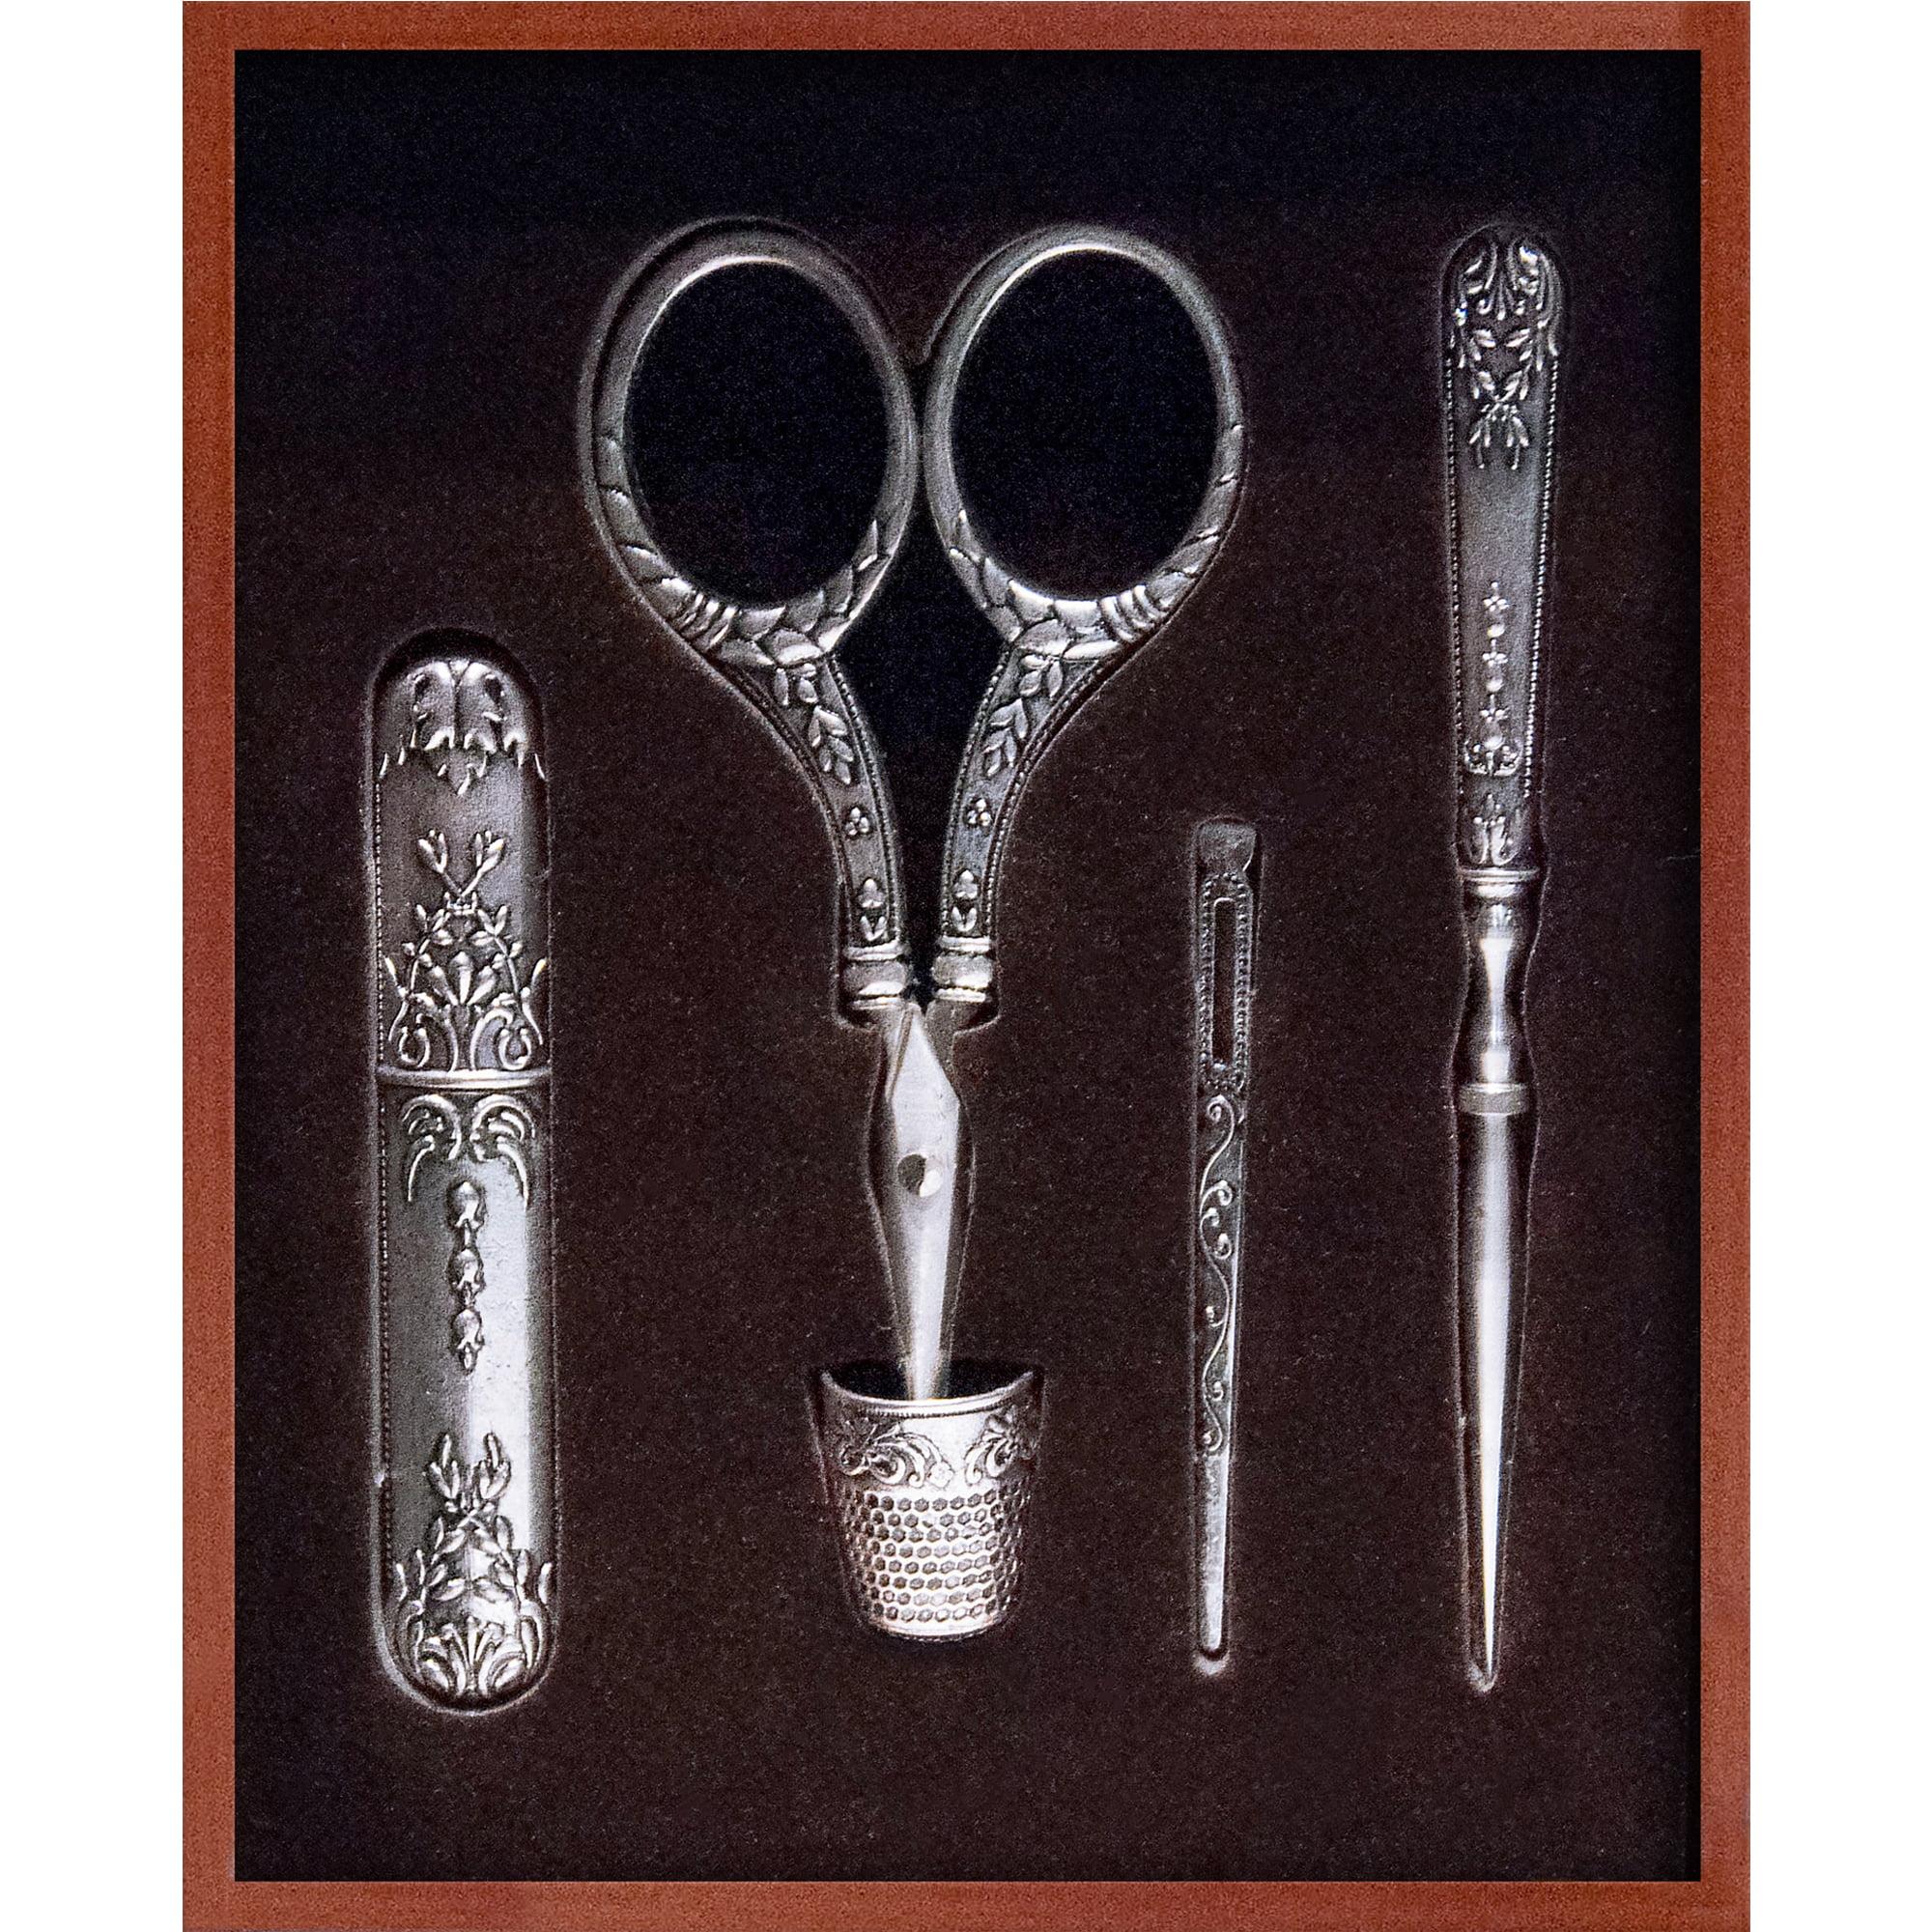 Sullivan's 5-piece Heirloom Embroidery Accessories Keepsake Box